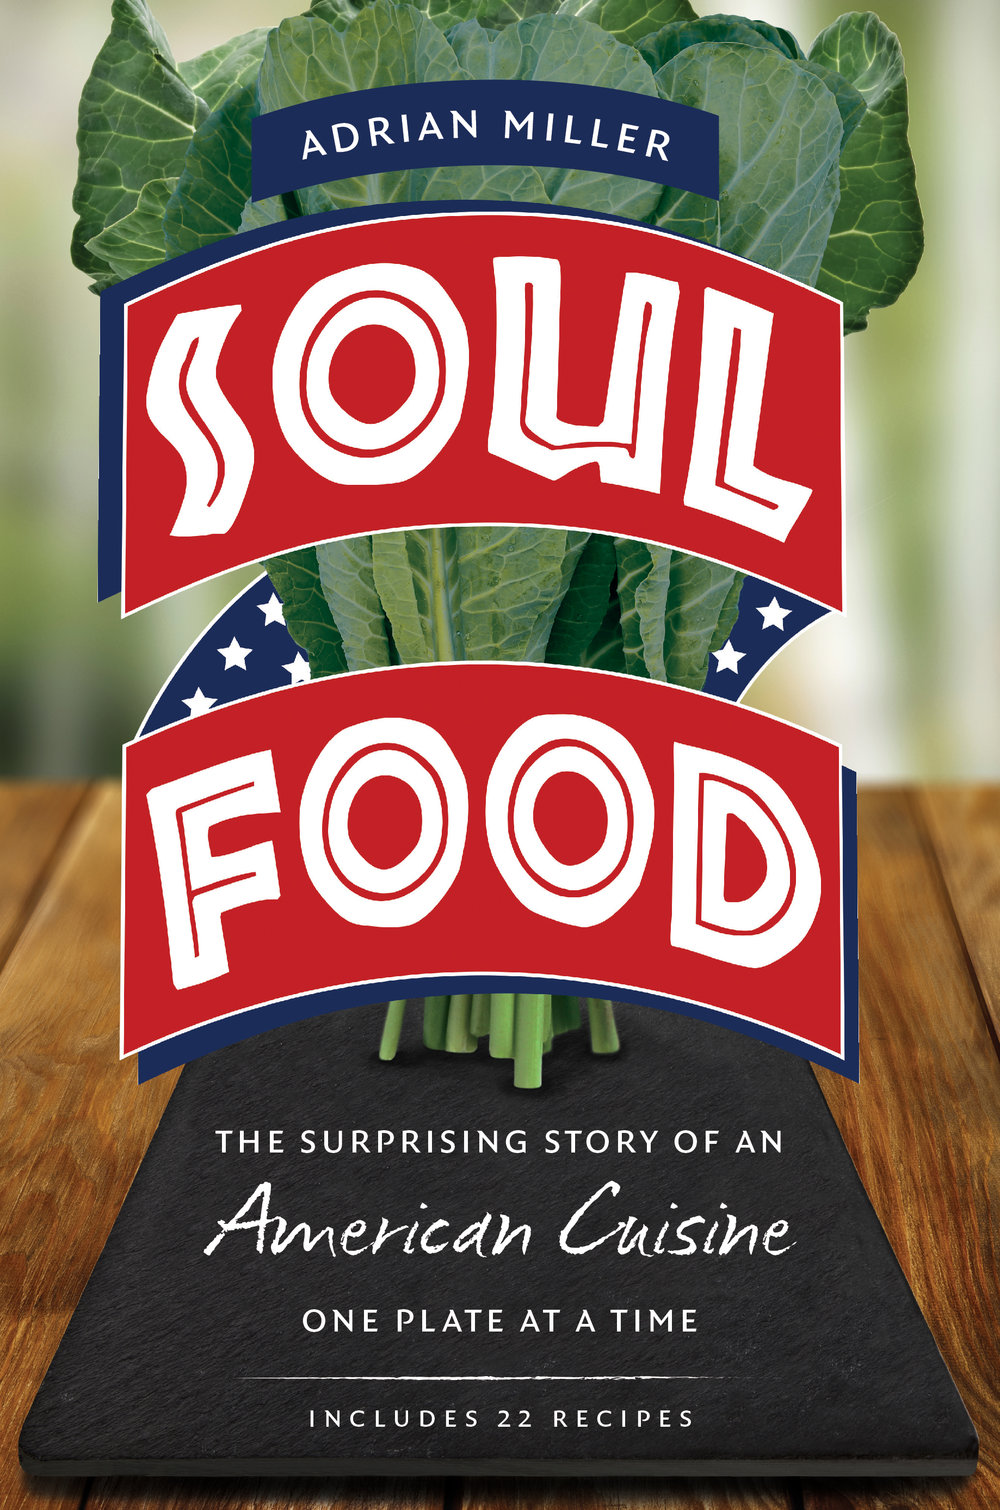 SOUL FOOD Cover Image.jpg